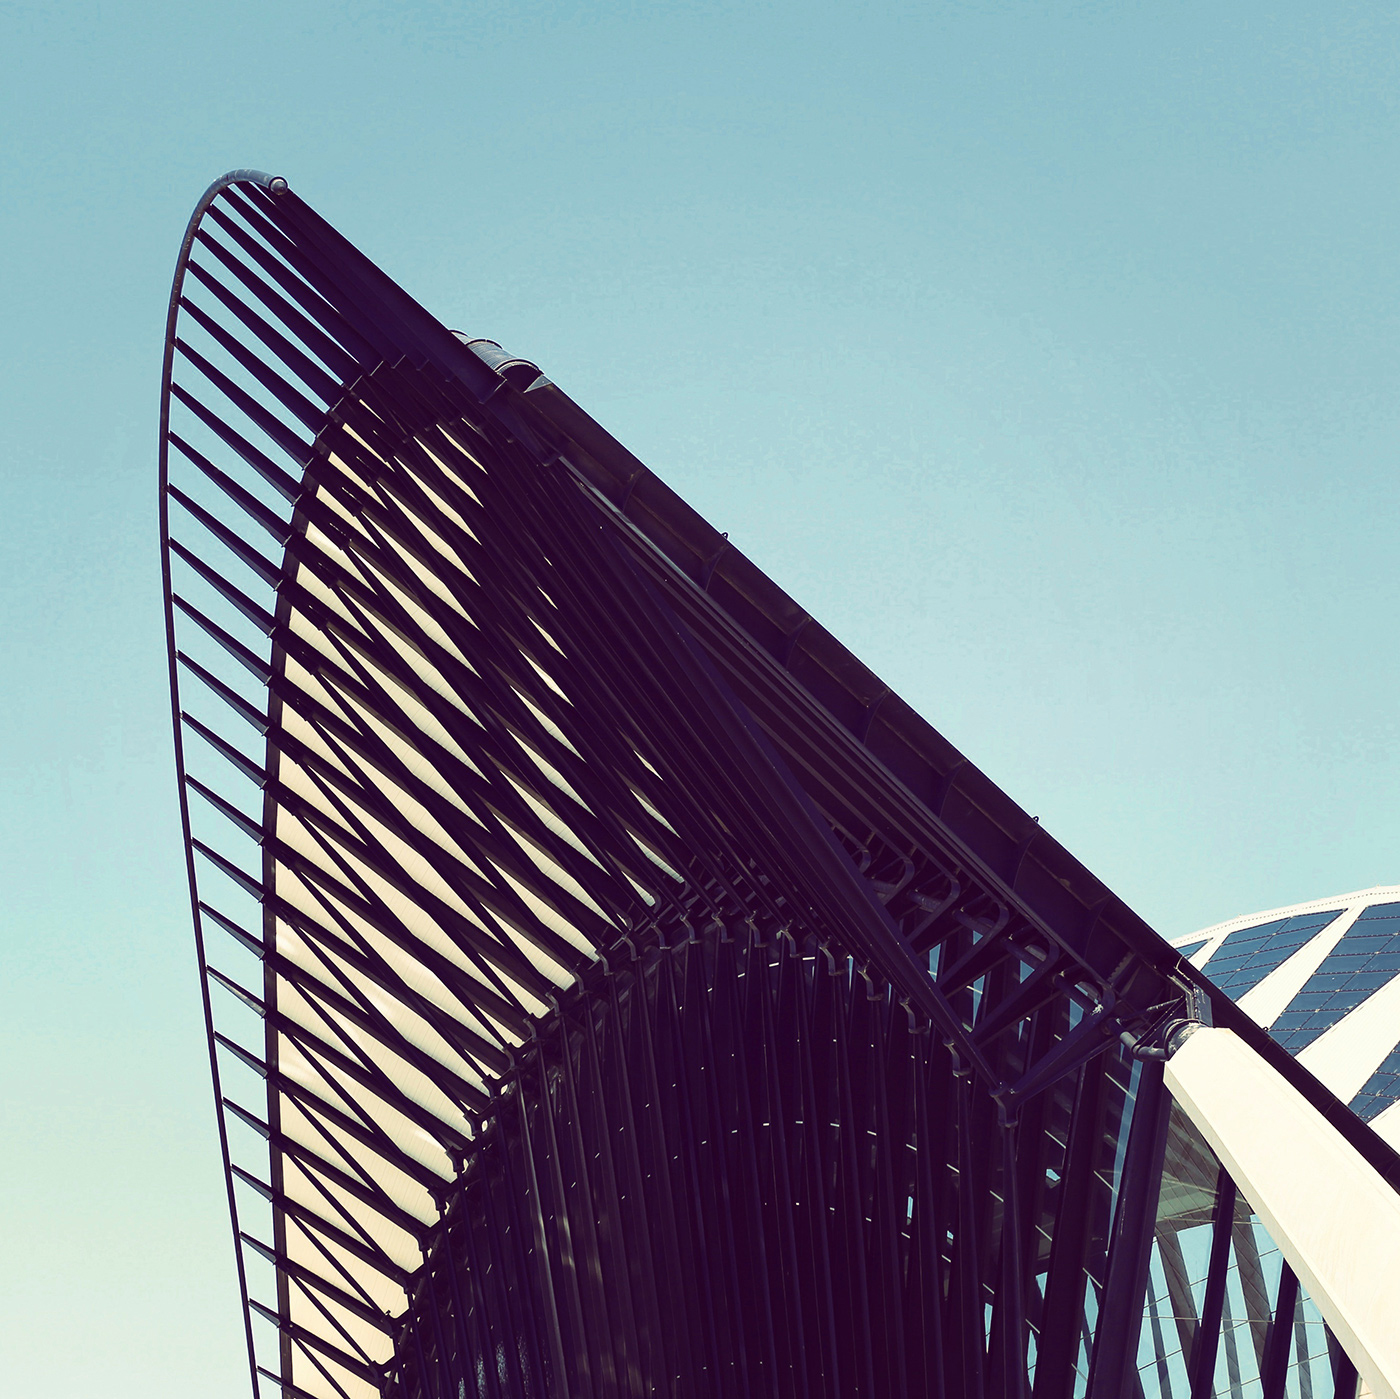 Gare de Lyon Saint-Exupéry <br />Location: Lyon, France <br />Architect: Santiago Calatrava